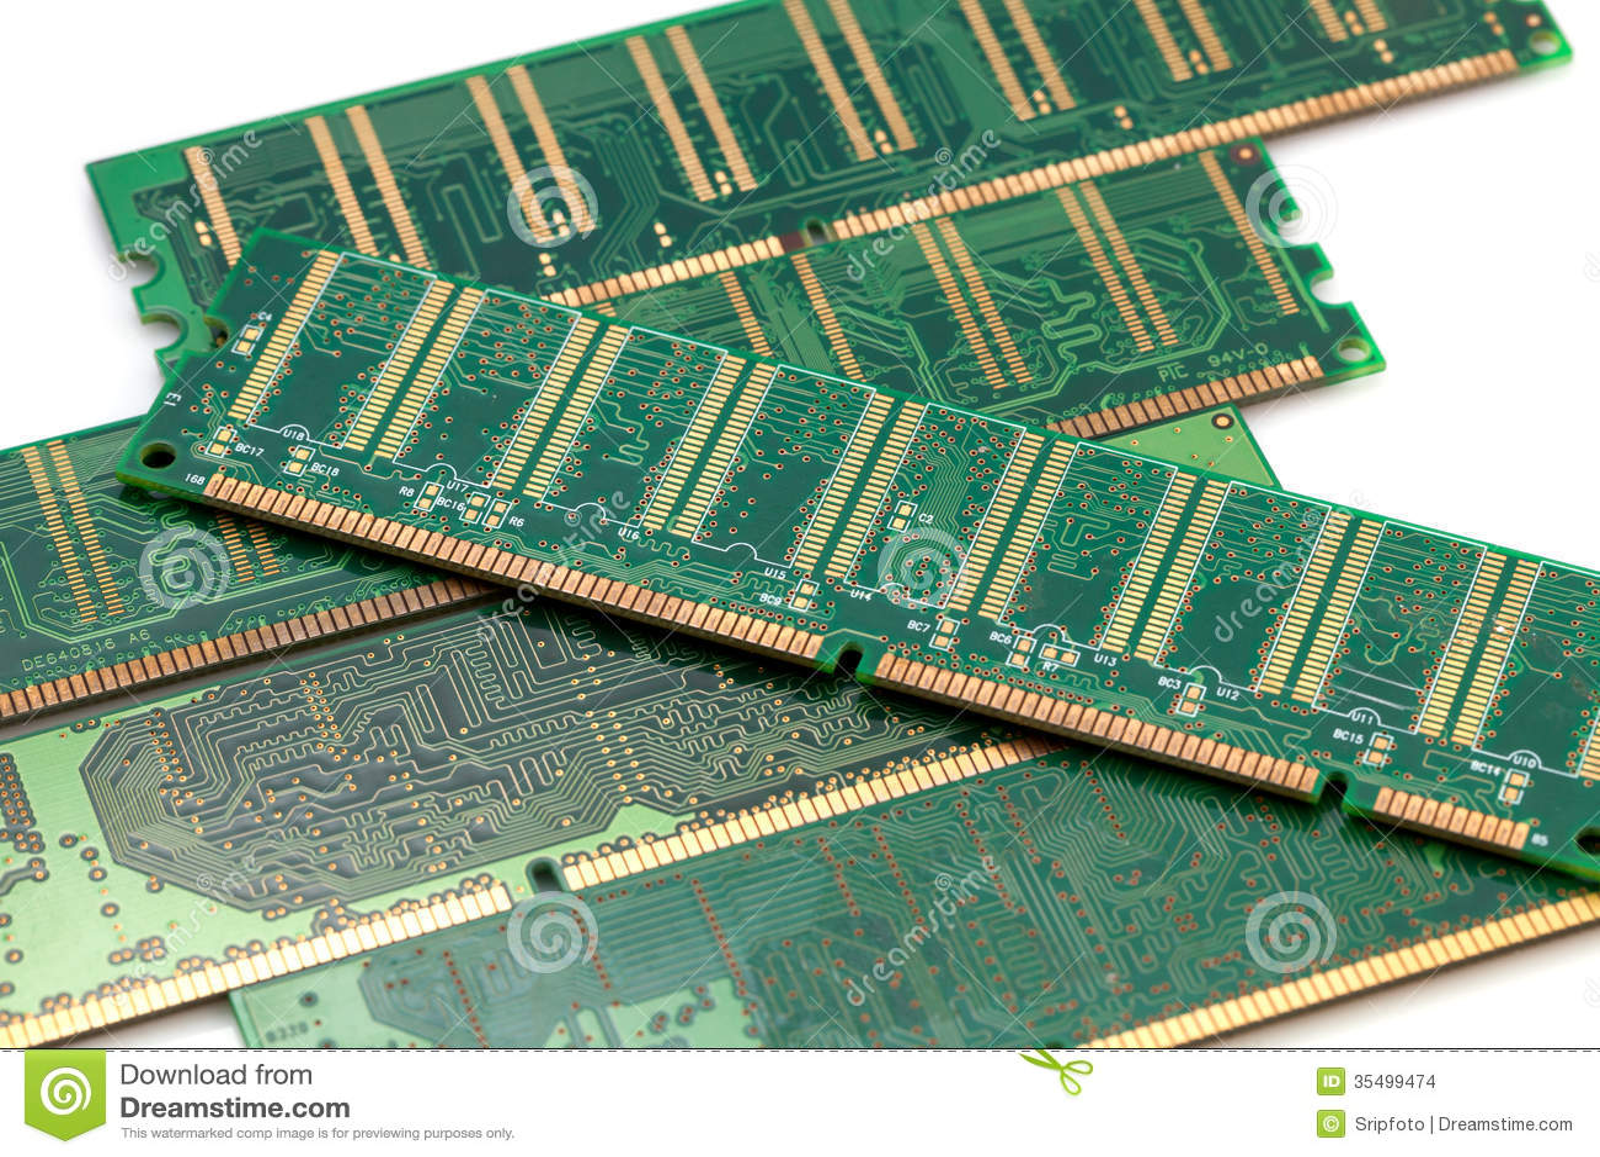 random access memory ram stock images image 35499474. Black Bedroom Furniture Sets. Home Design Ideas